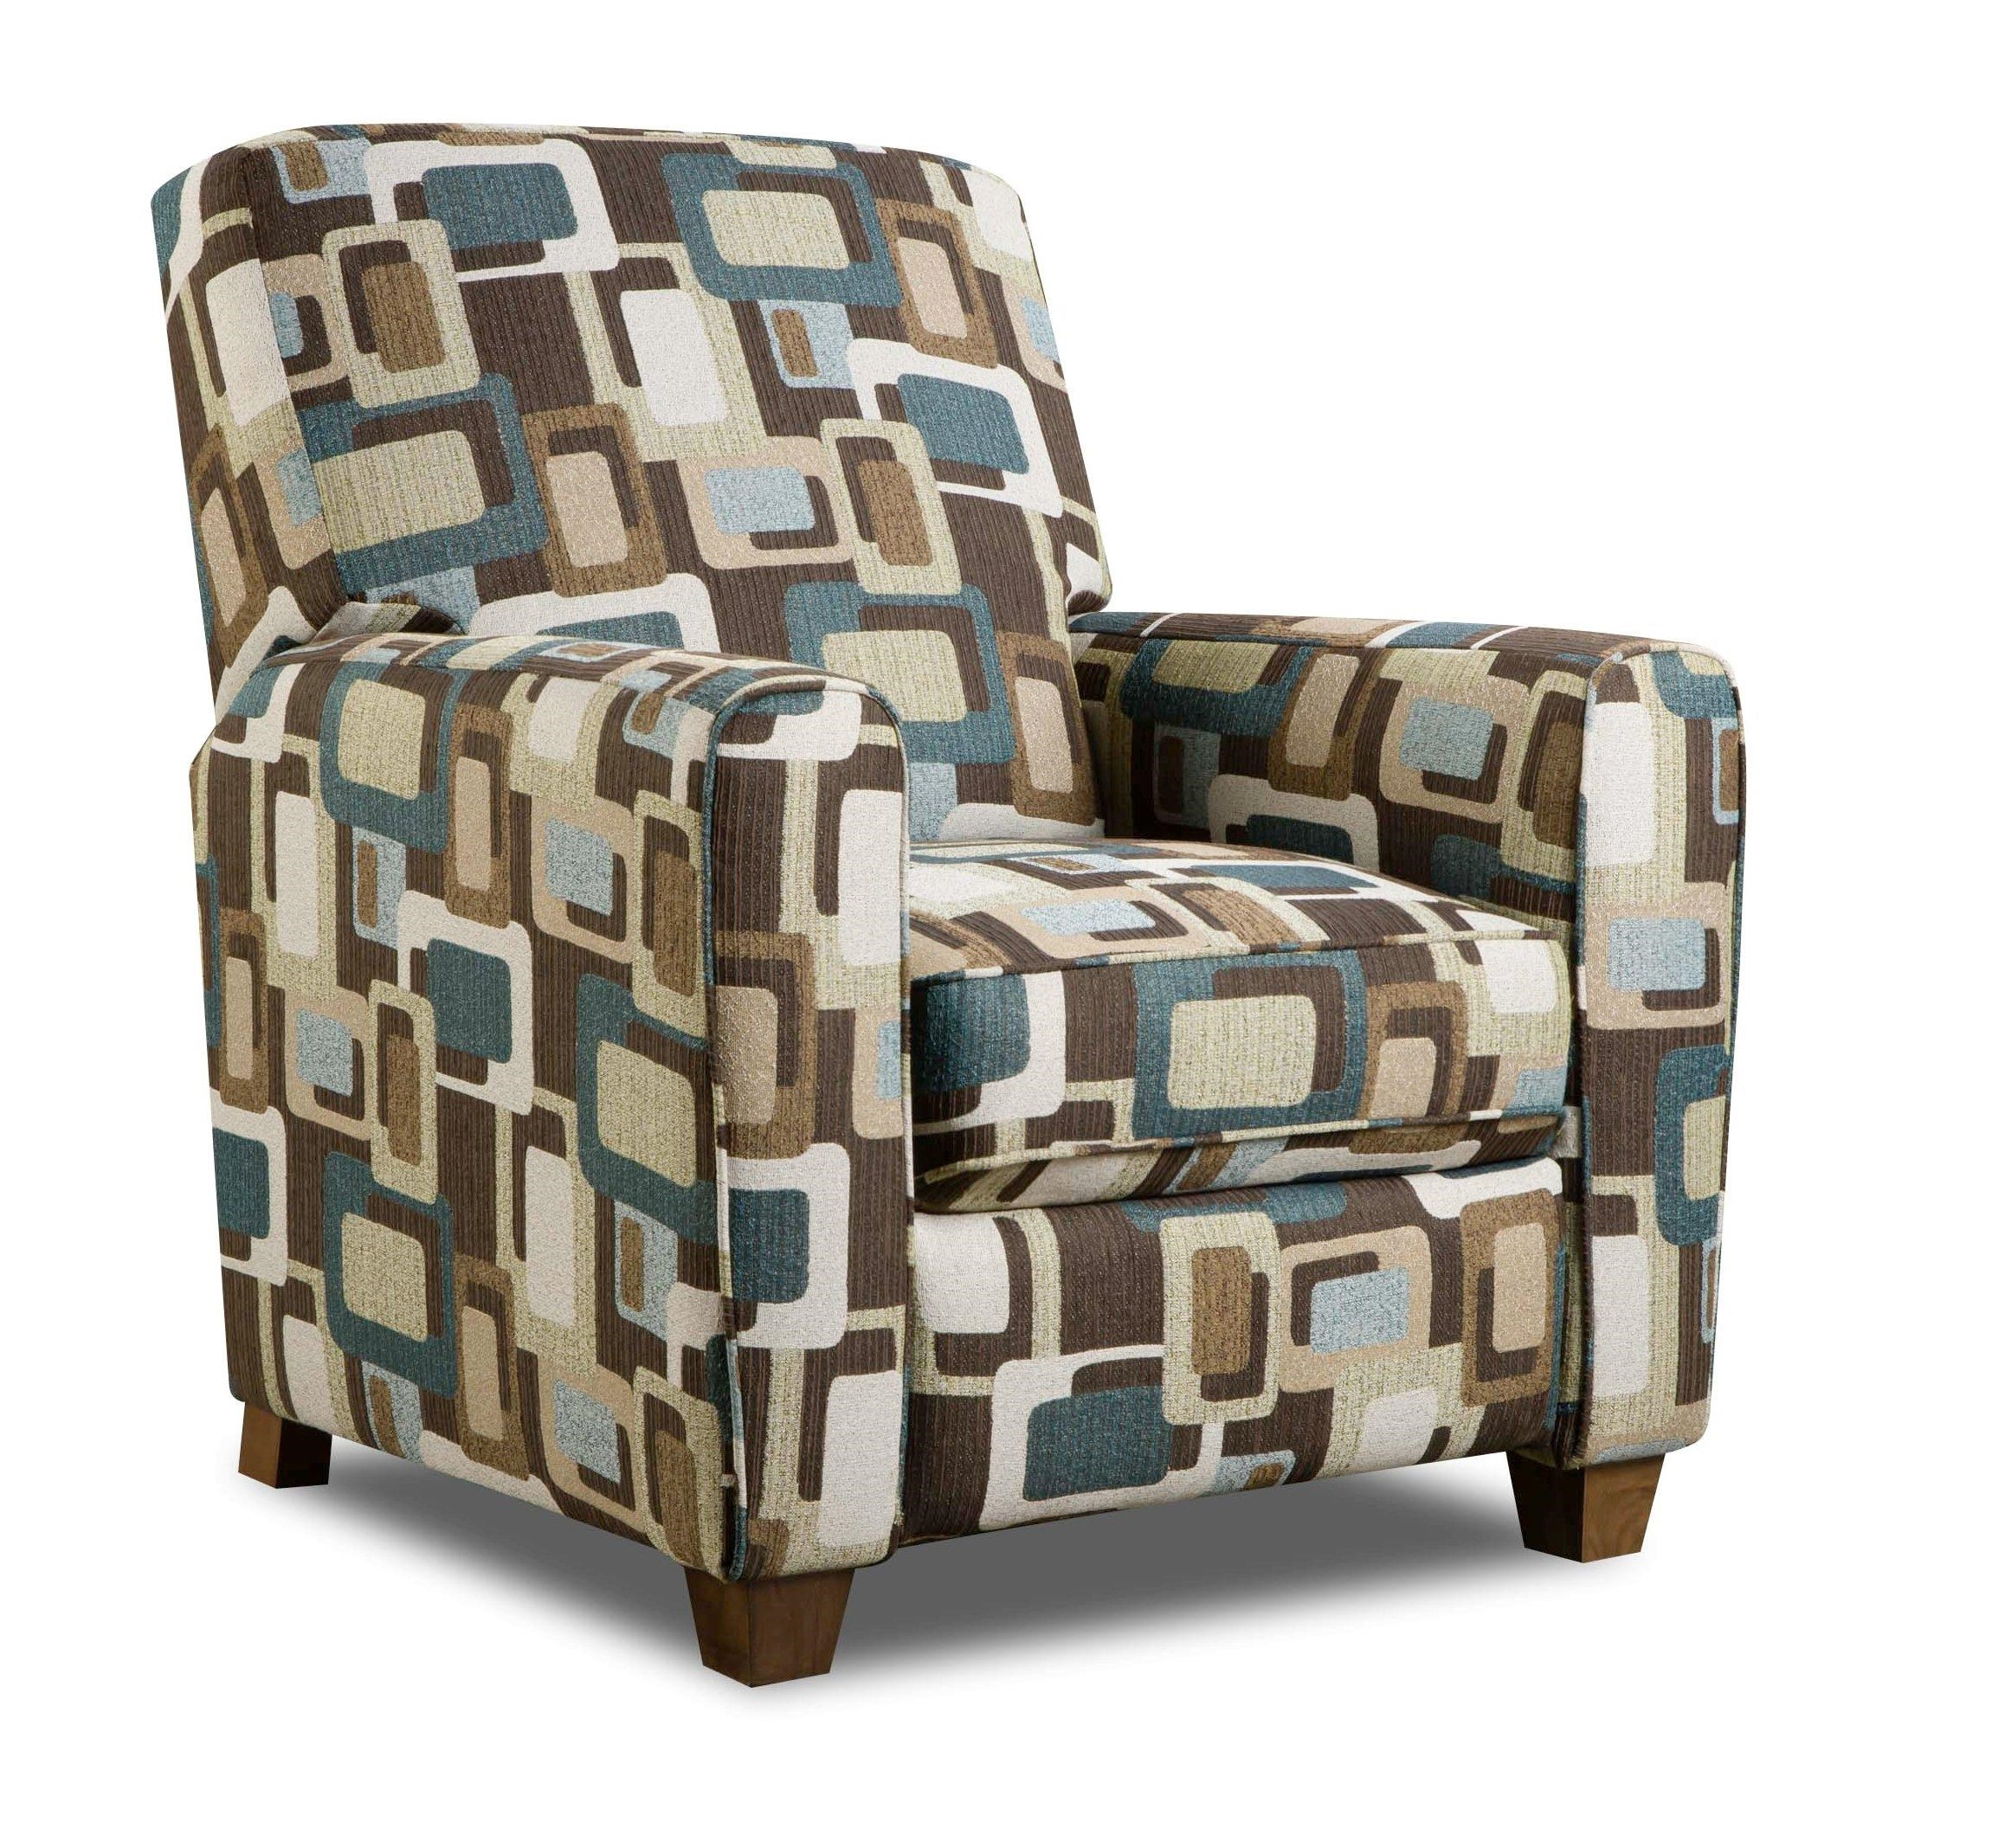 American Furniture Recliners Low Leg Retro Accent Recliner